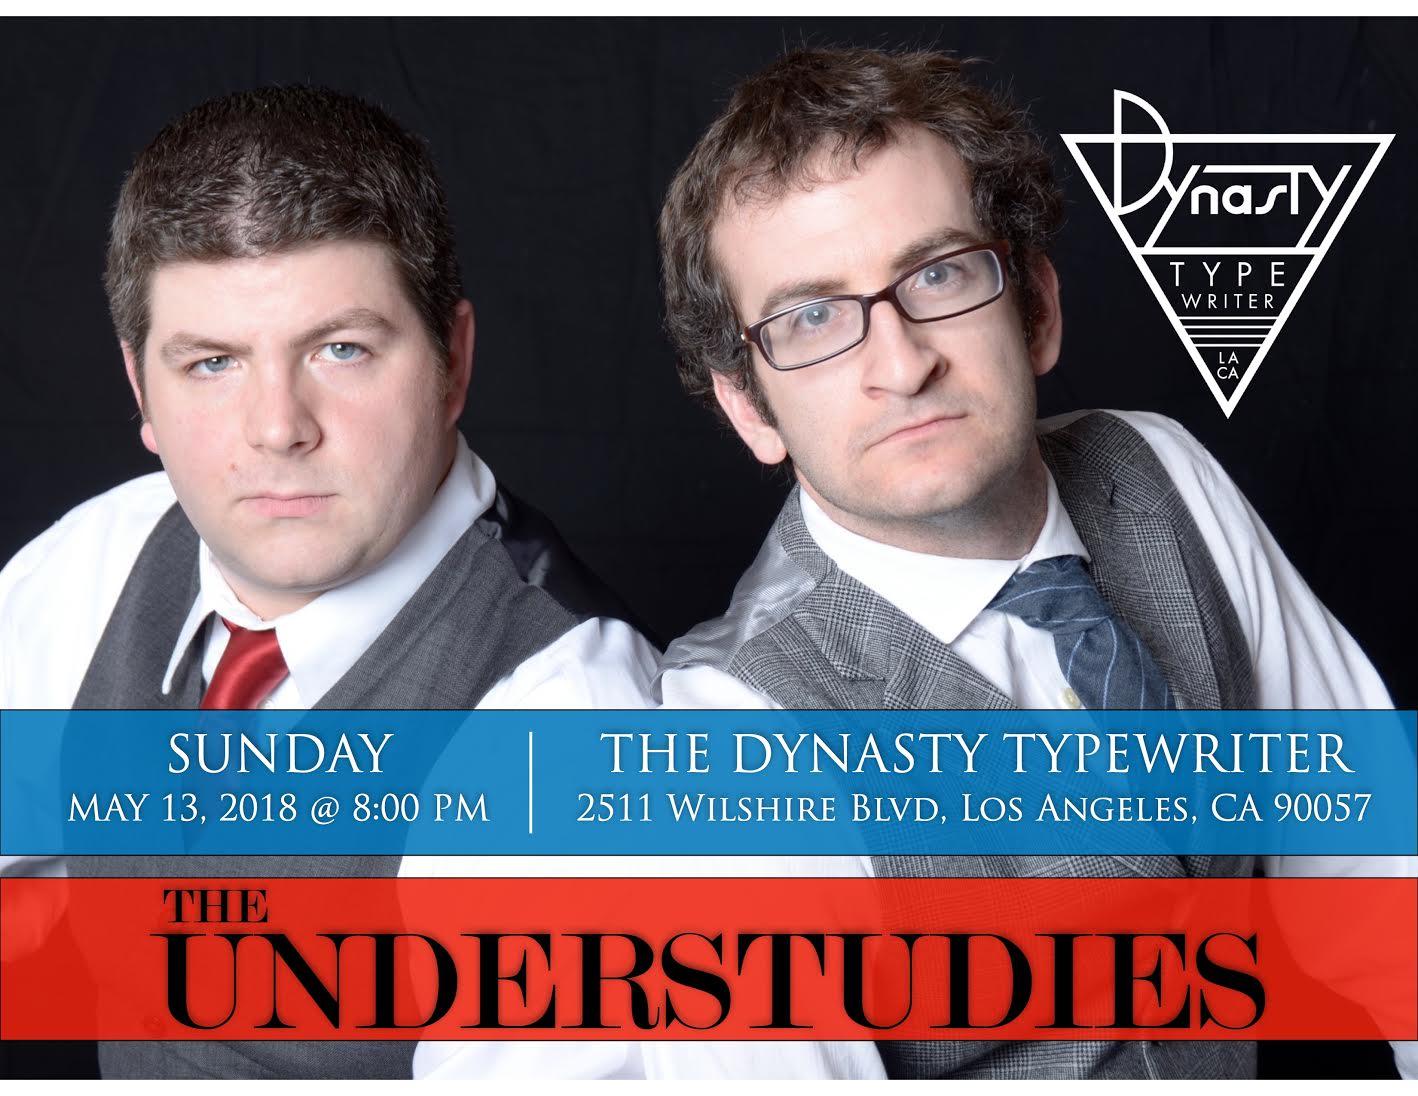 Dynasty Flyer.jpg